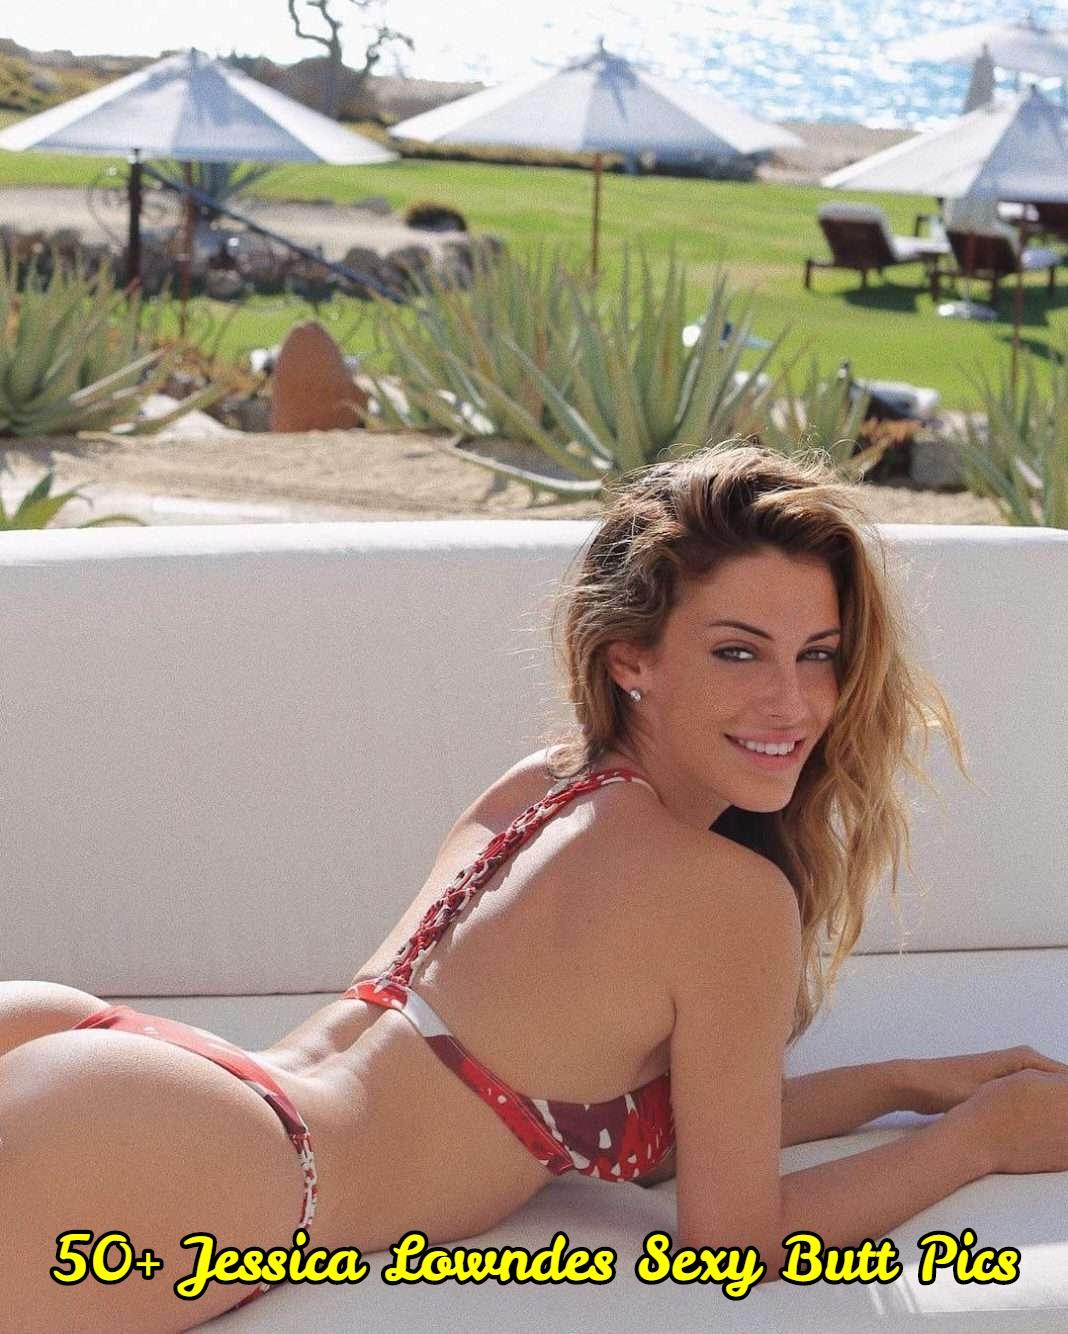 Jessica Lowndes sexy butt pics